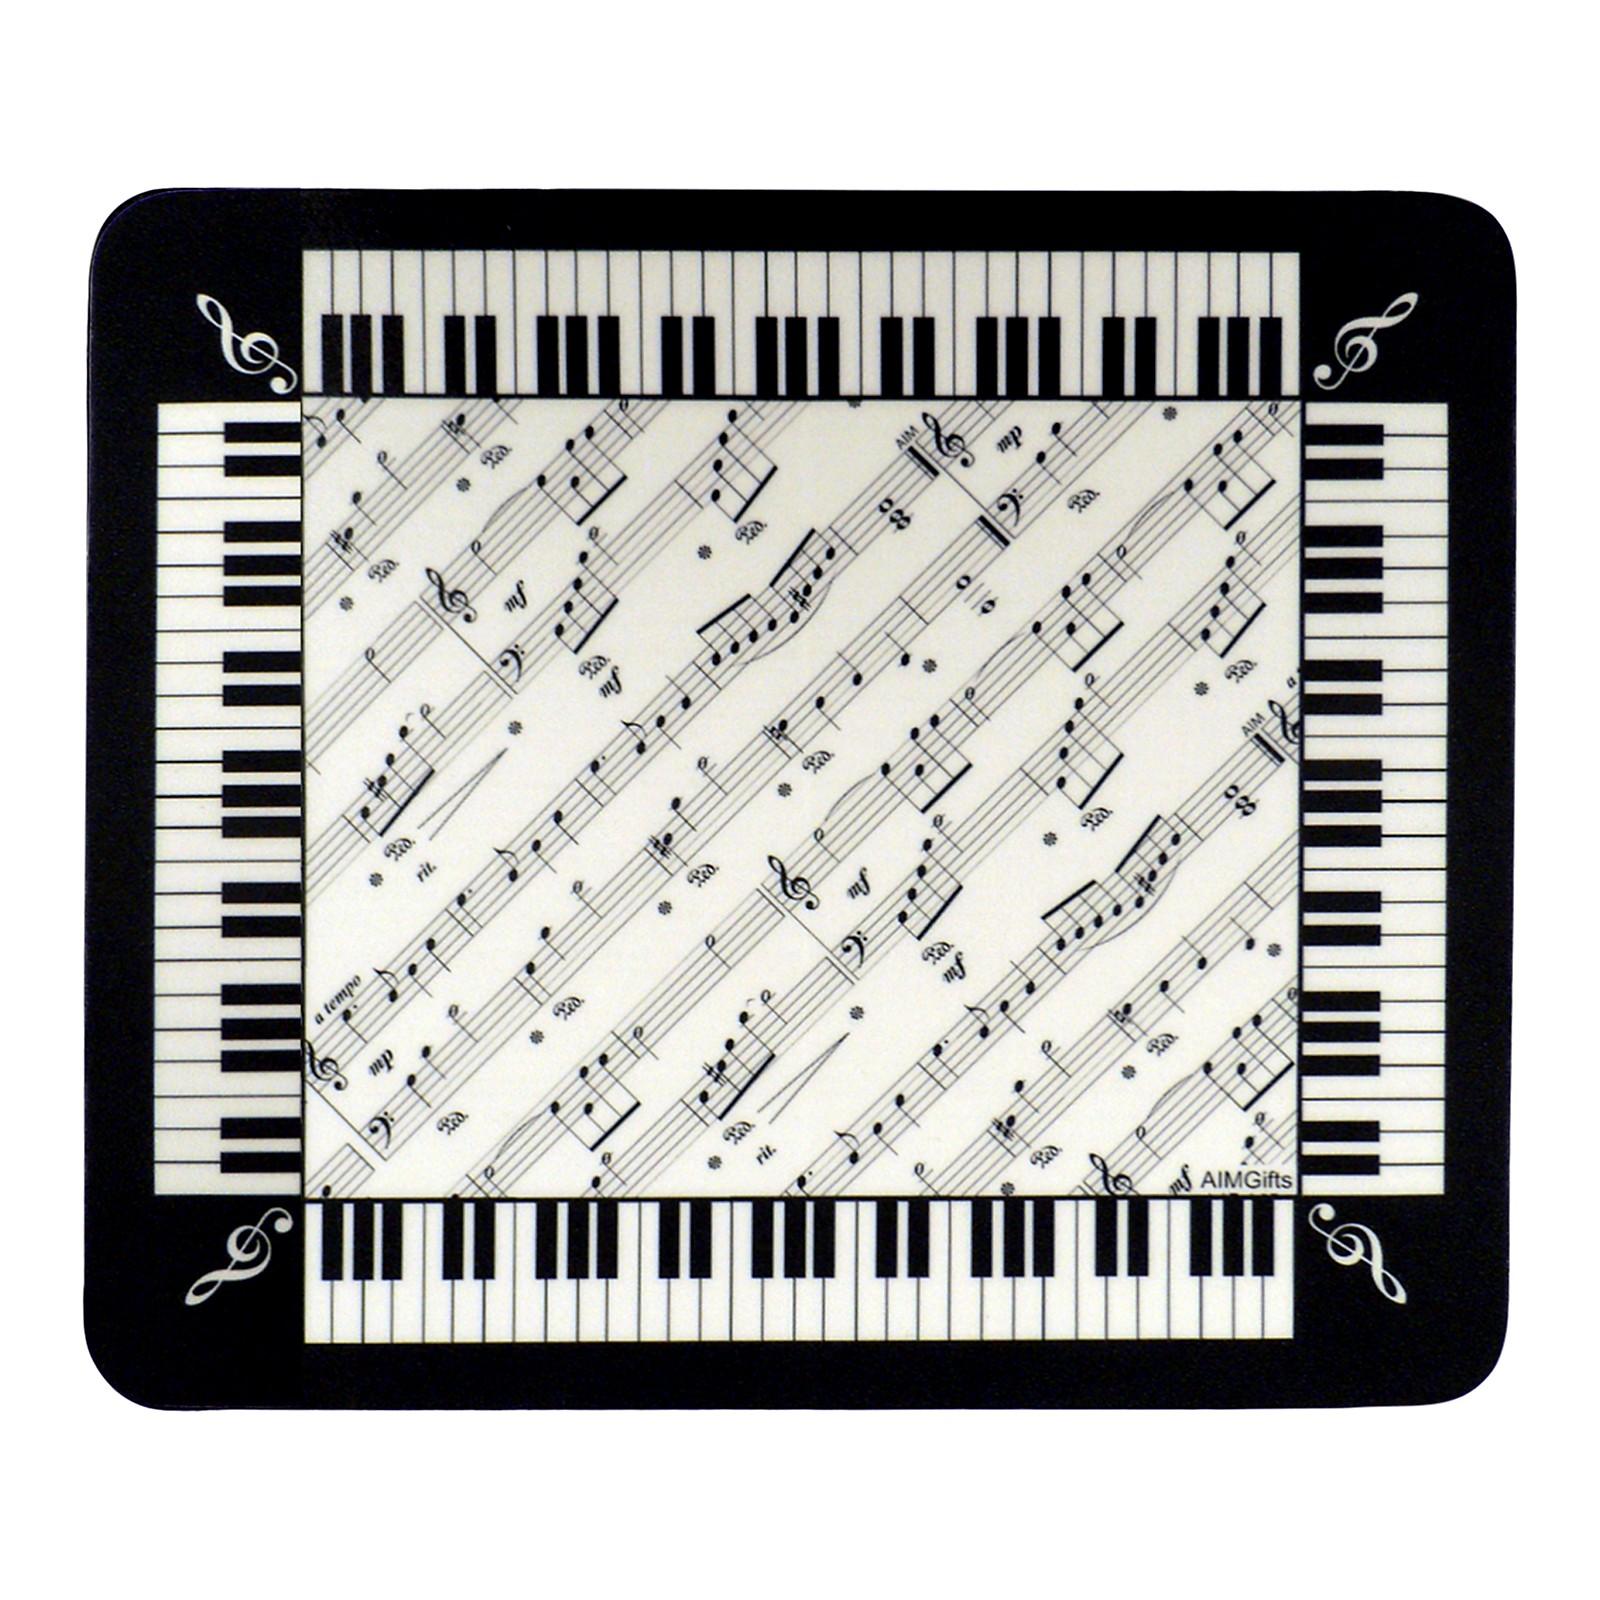 AIM Mouse Pad Sheet Music